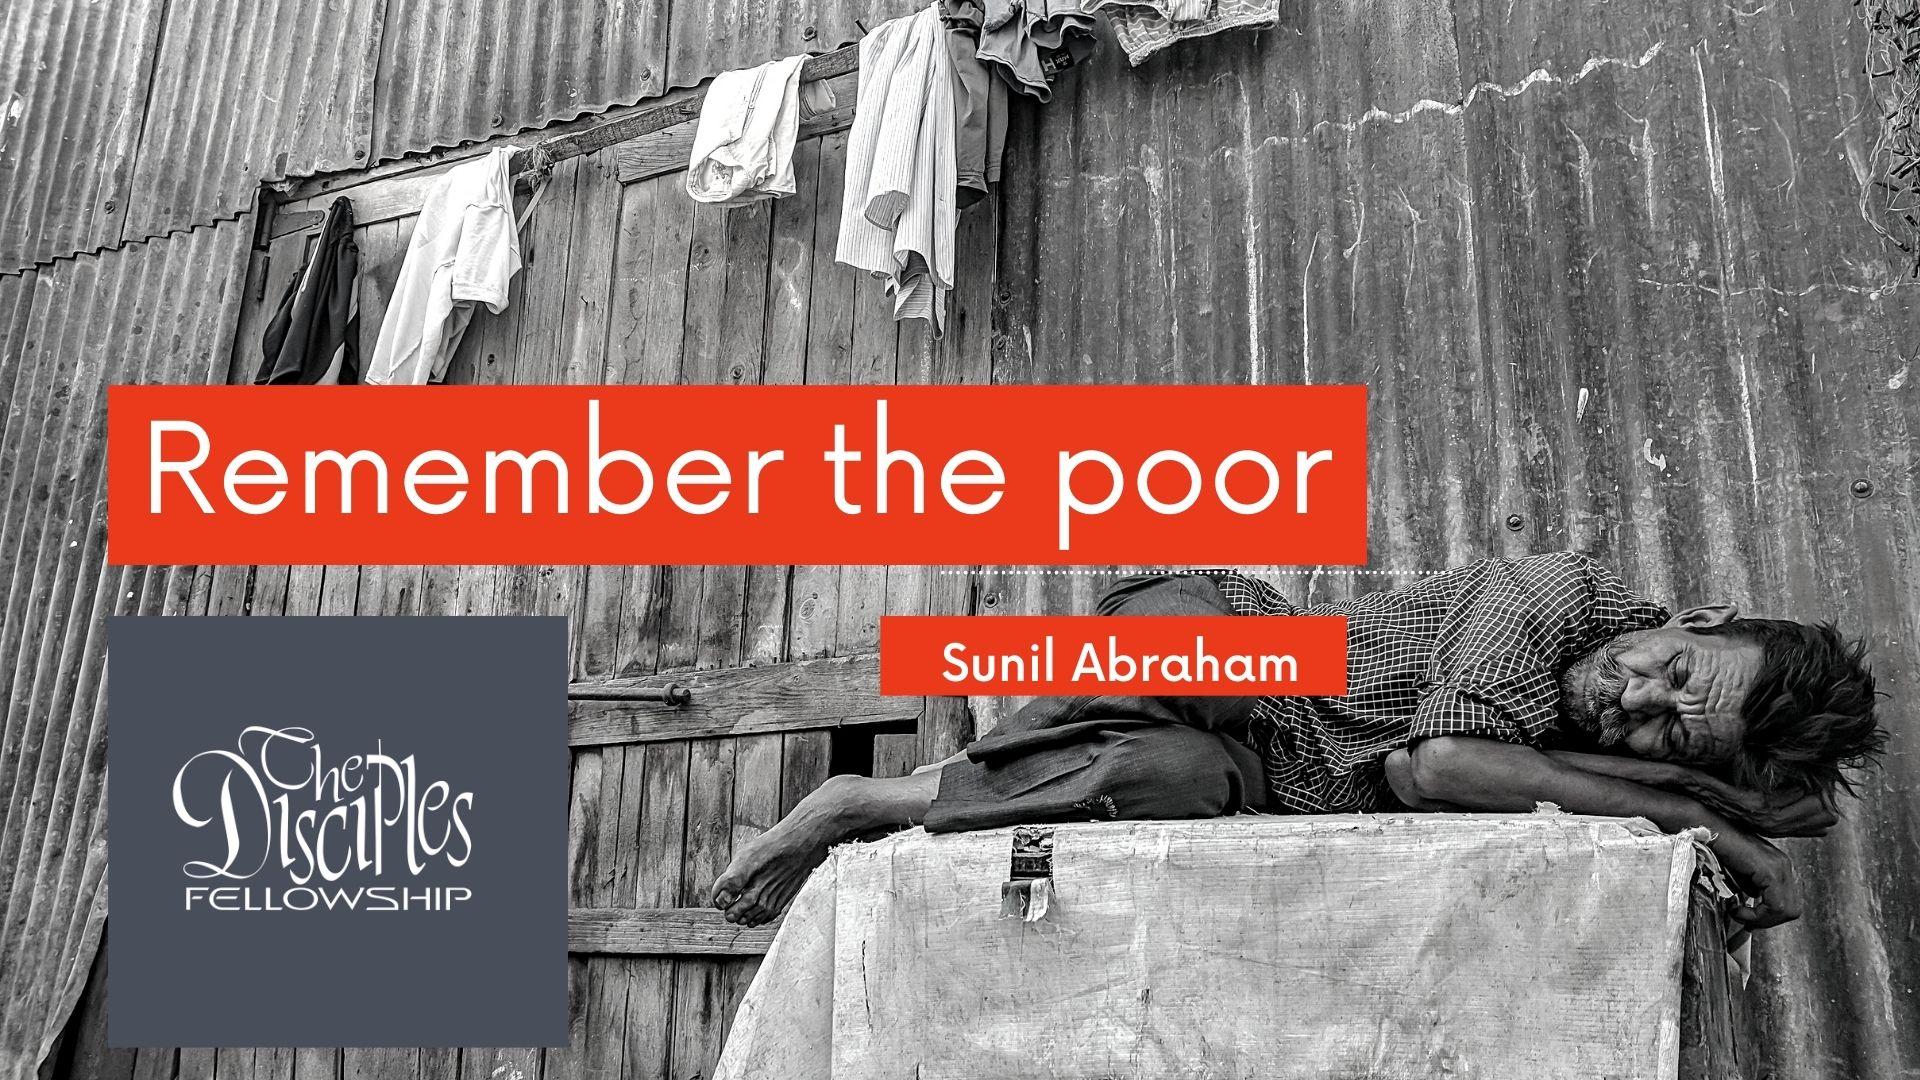 Easter Exhortation & Sermon|Remember the Poor <br/>Sunil Abraham